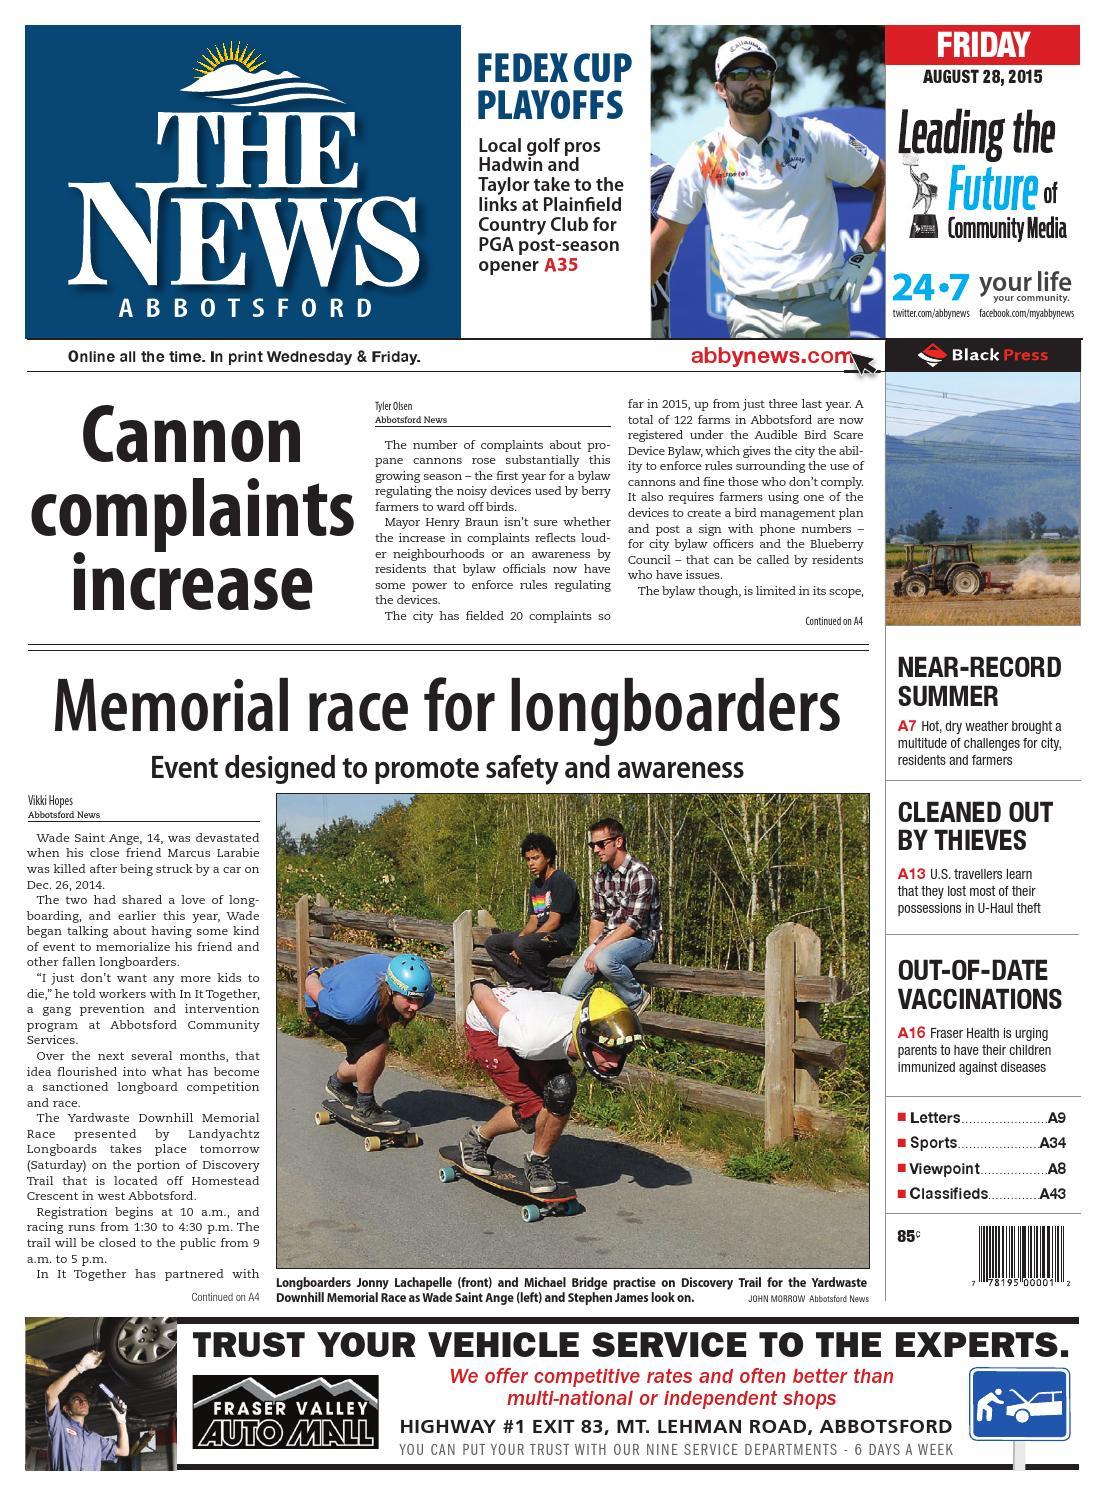 Abbotsford News, August 28, 2015 by Black Press - issuu